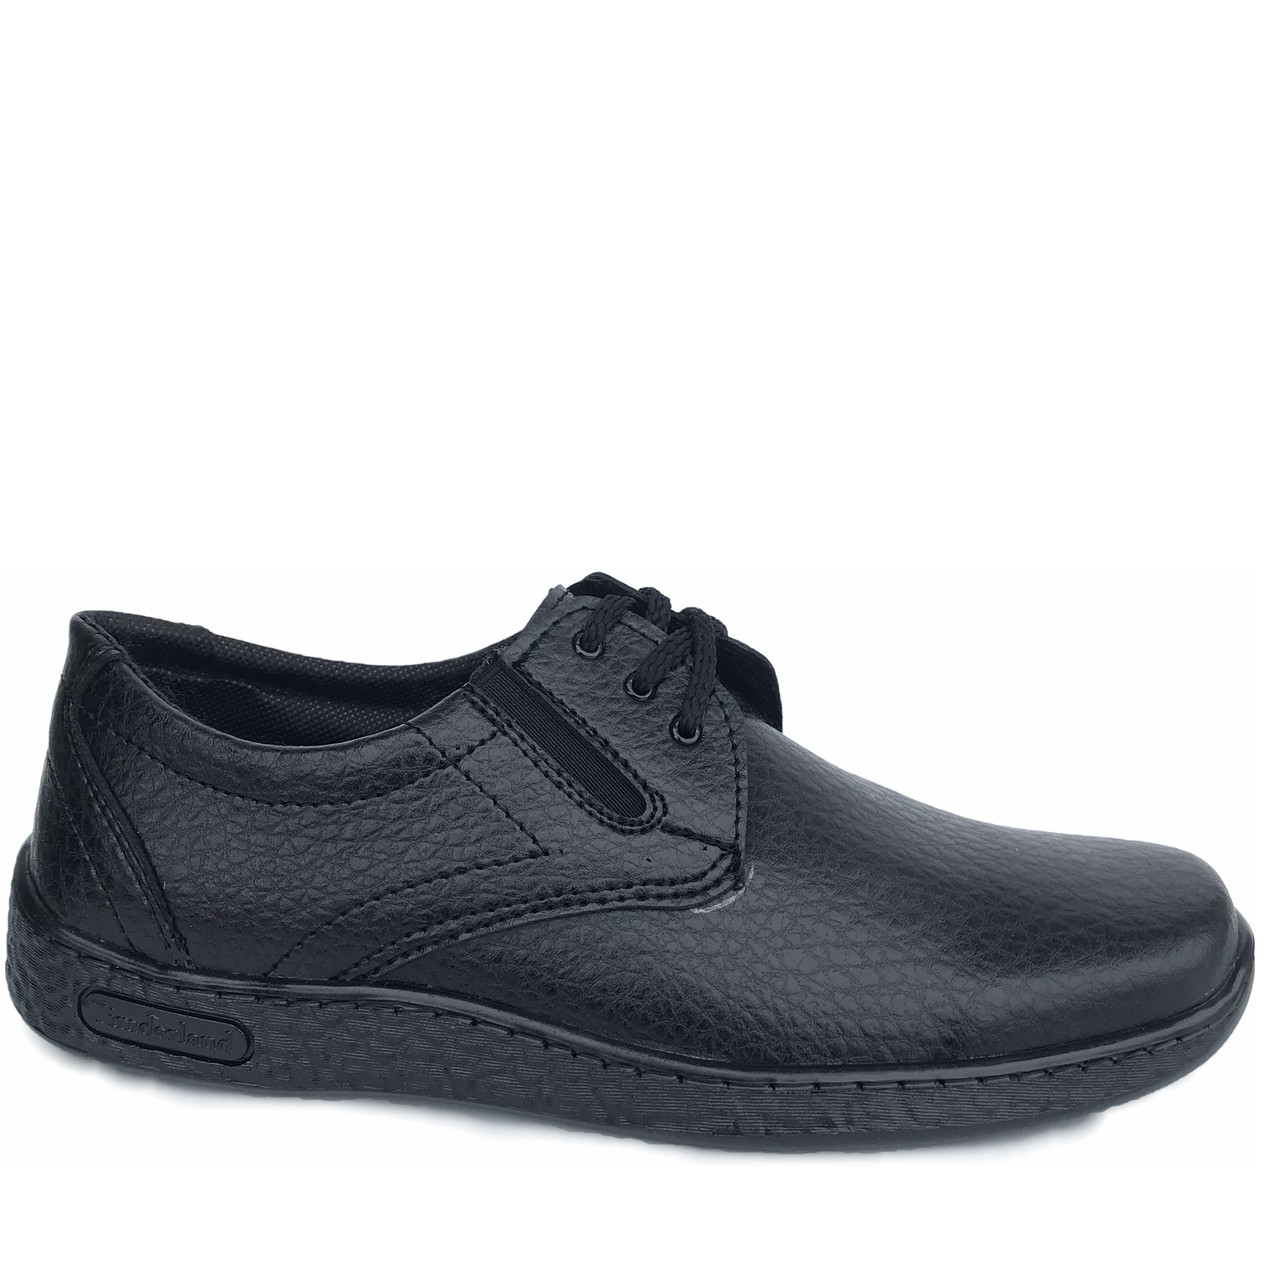 Туфли мужские на шнурках Анкор №2